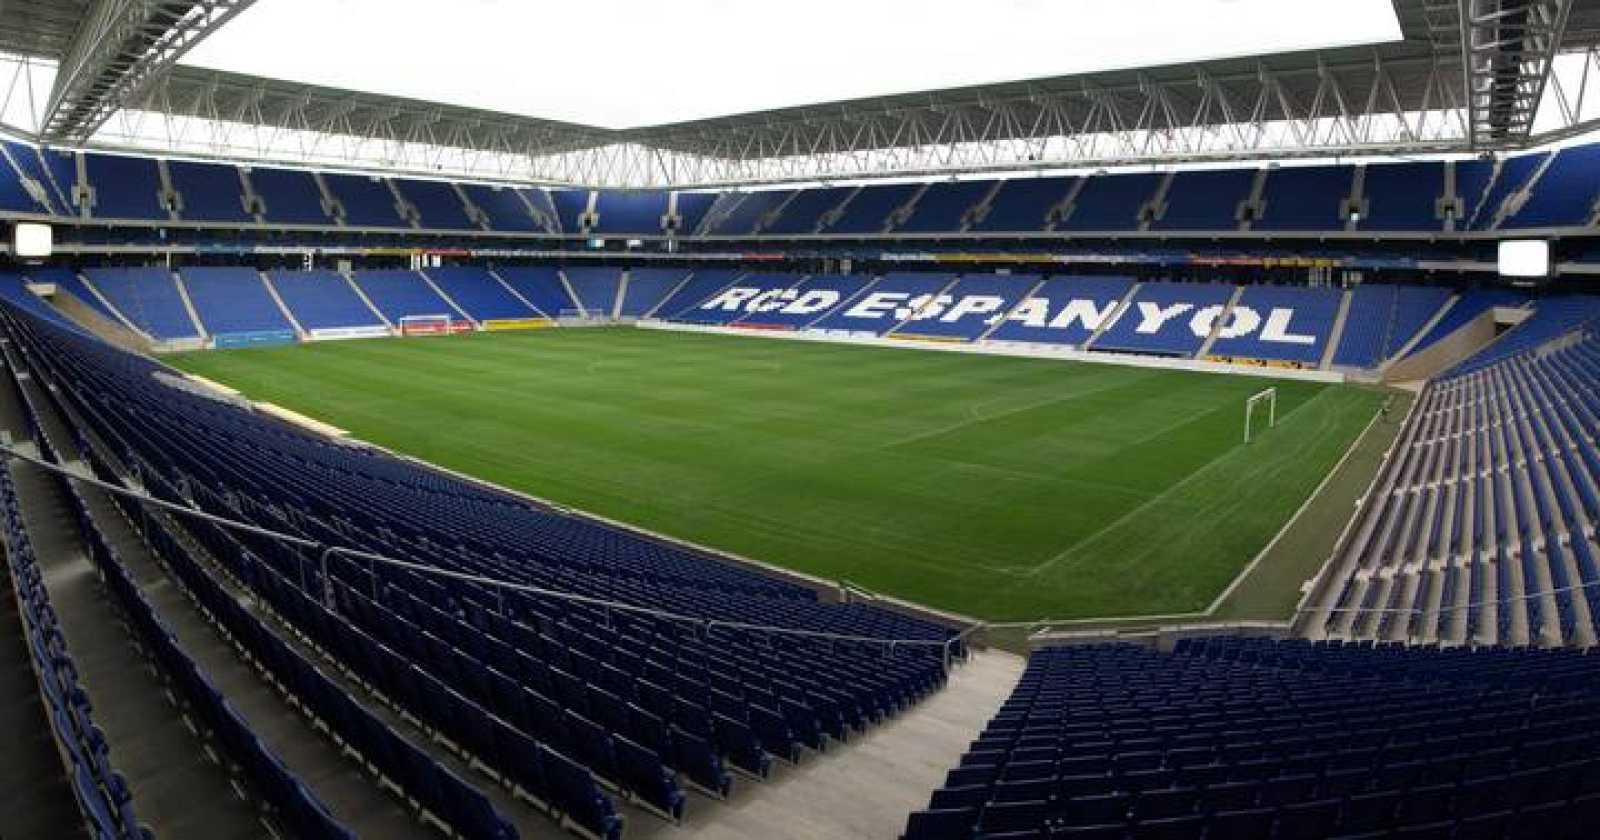 Estadio de Cornellá- El Prat